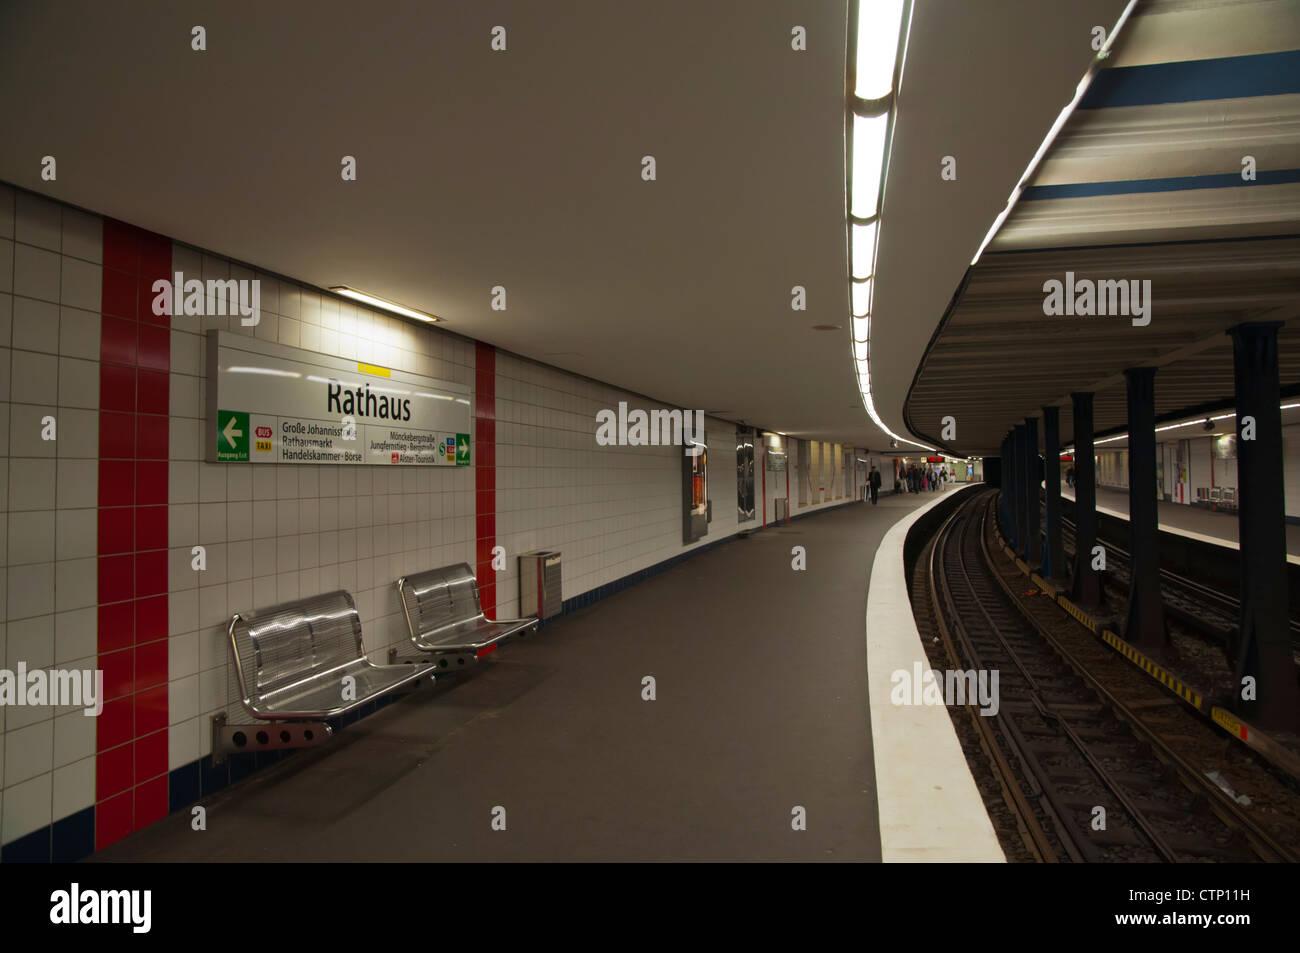 Rathaus metro station platform Hamburg Germany Europe - Stock Image